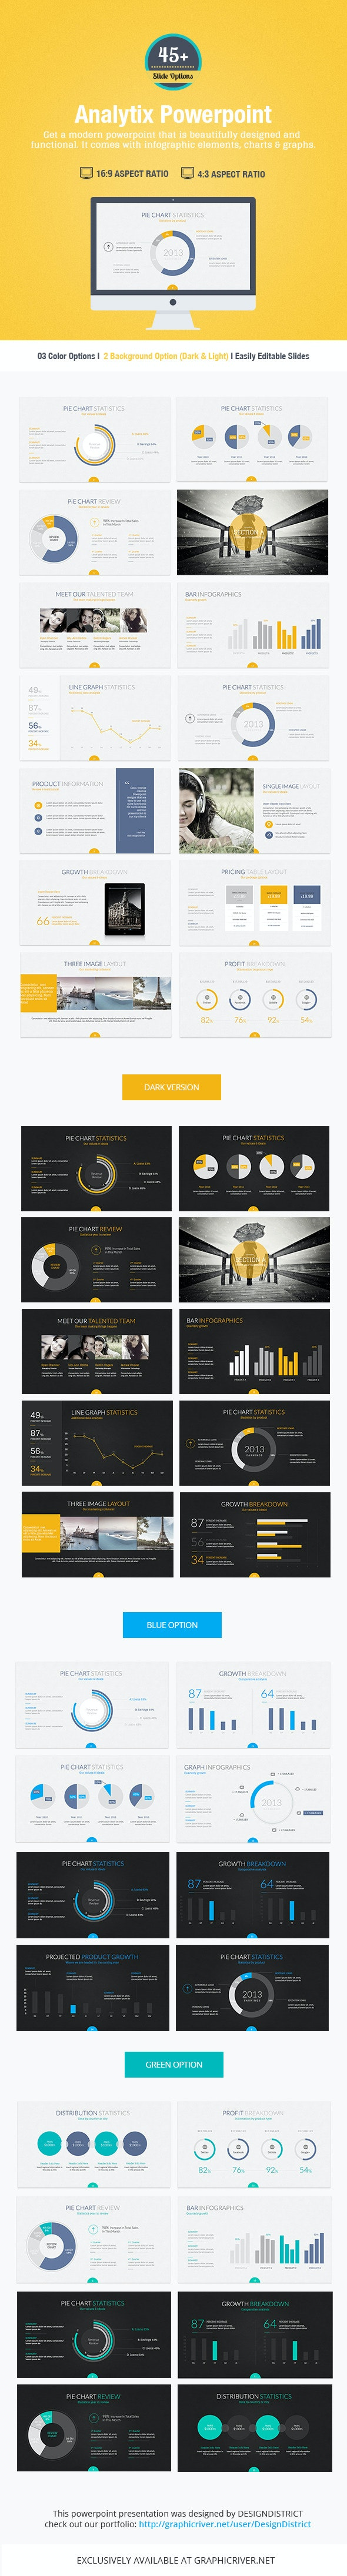 Analytix Powerpoint Presentation - Business PowerPoint Templates